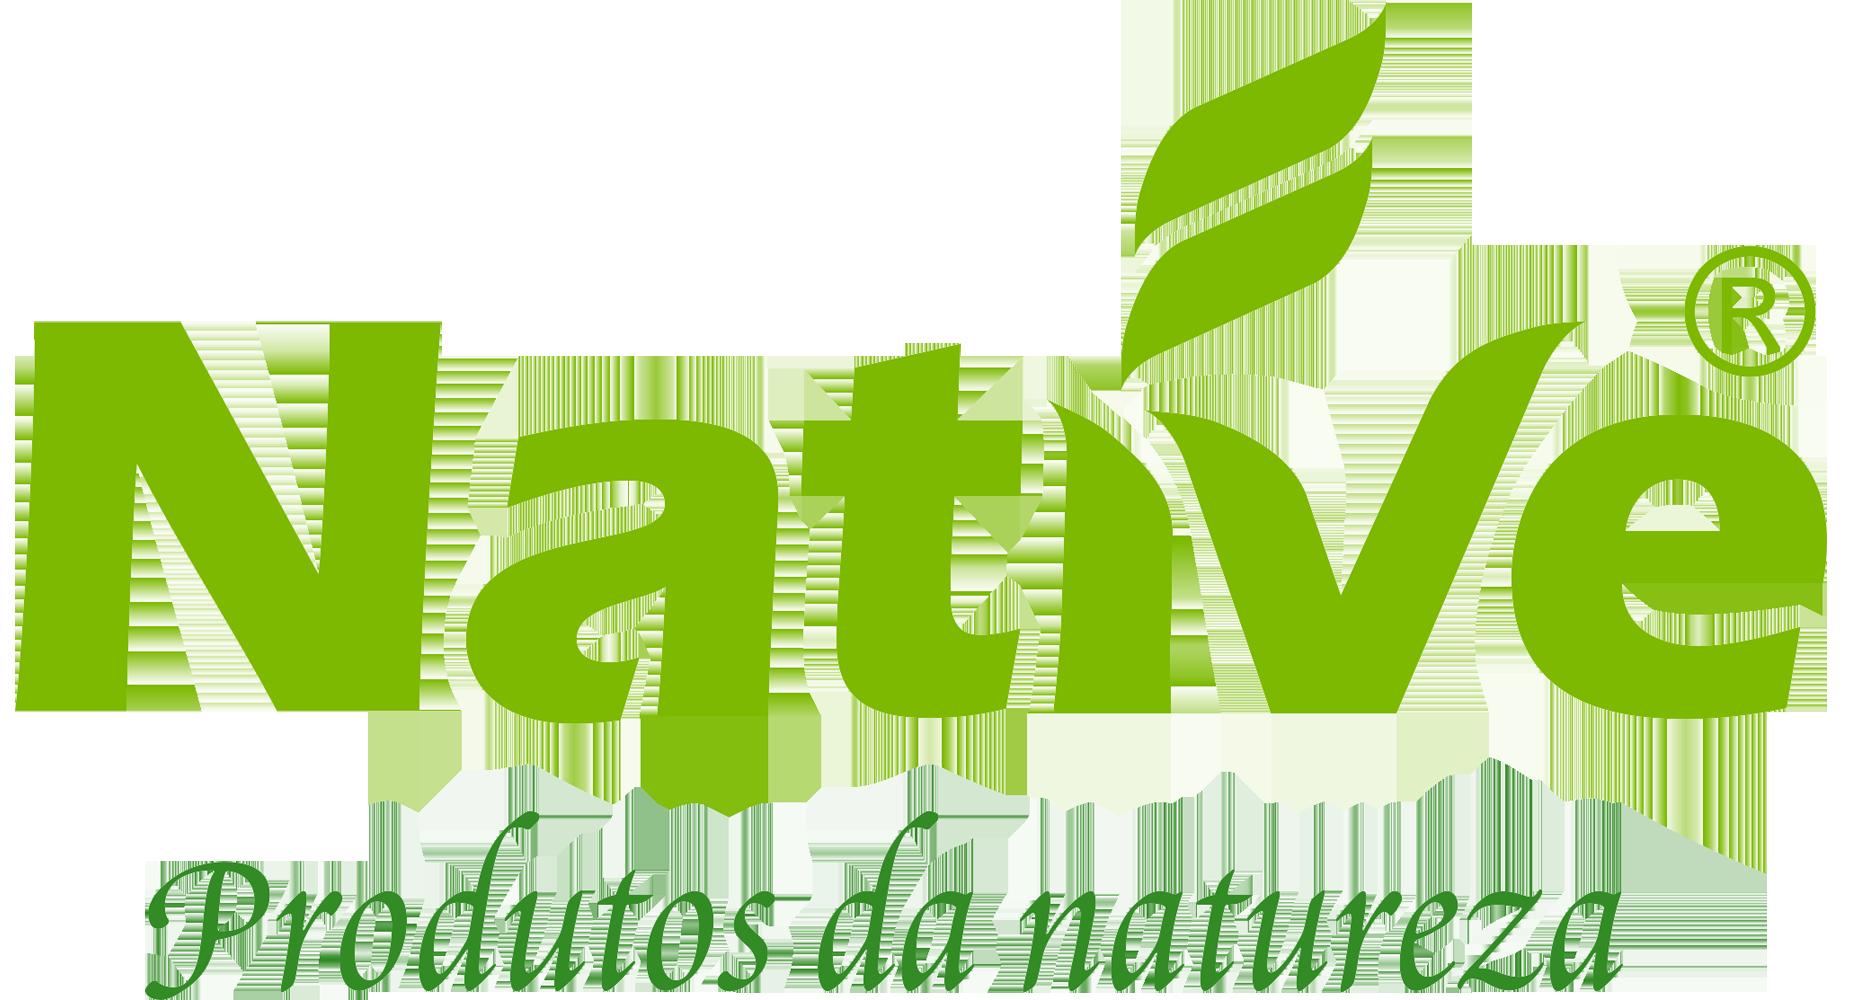 Brand native